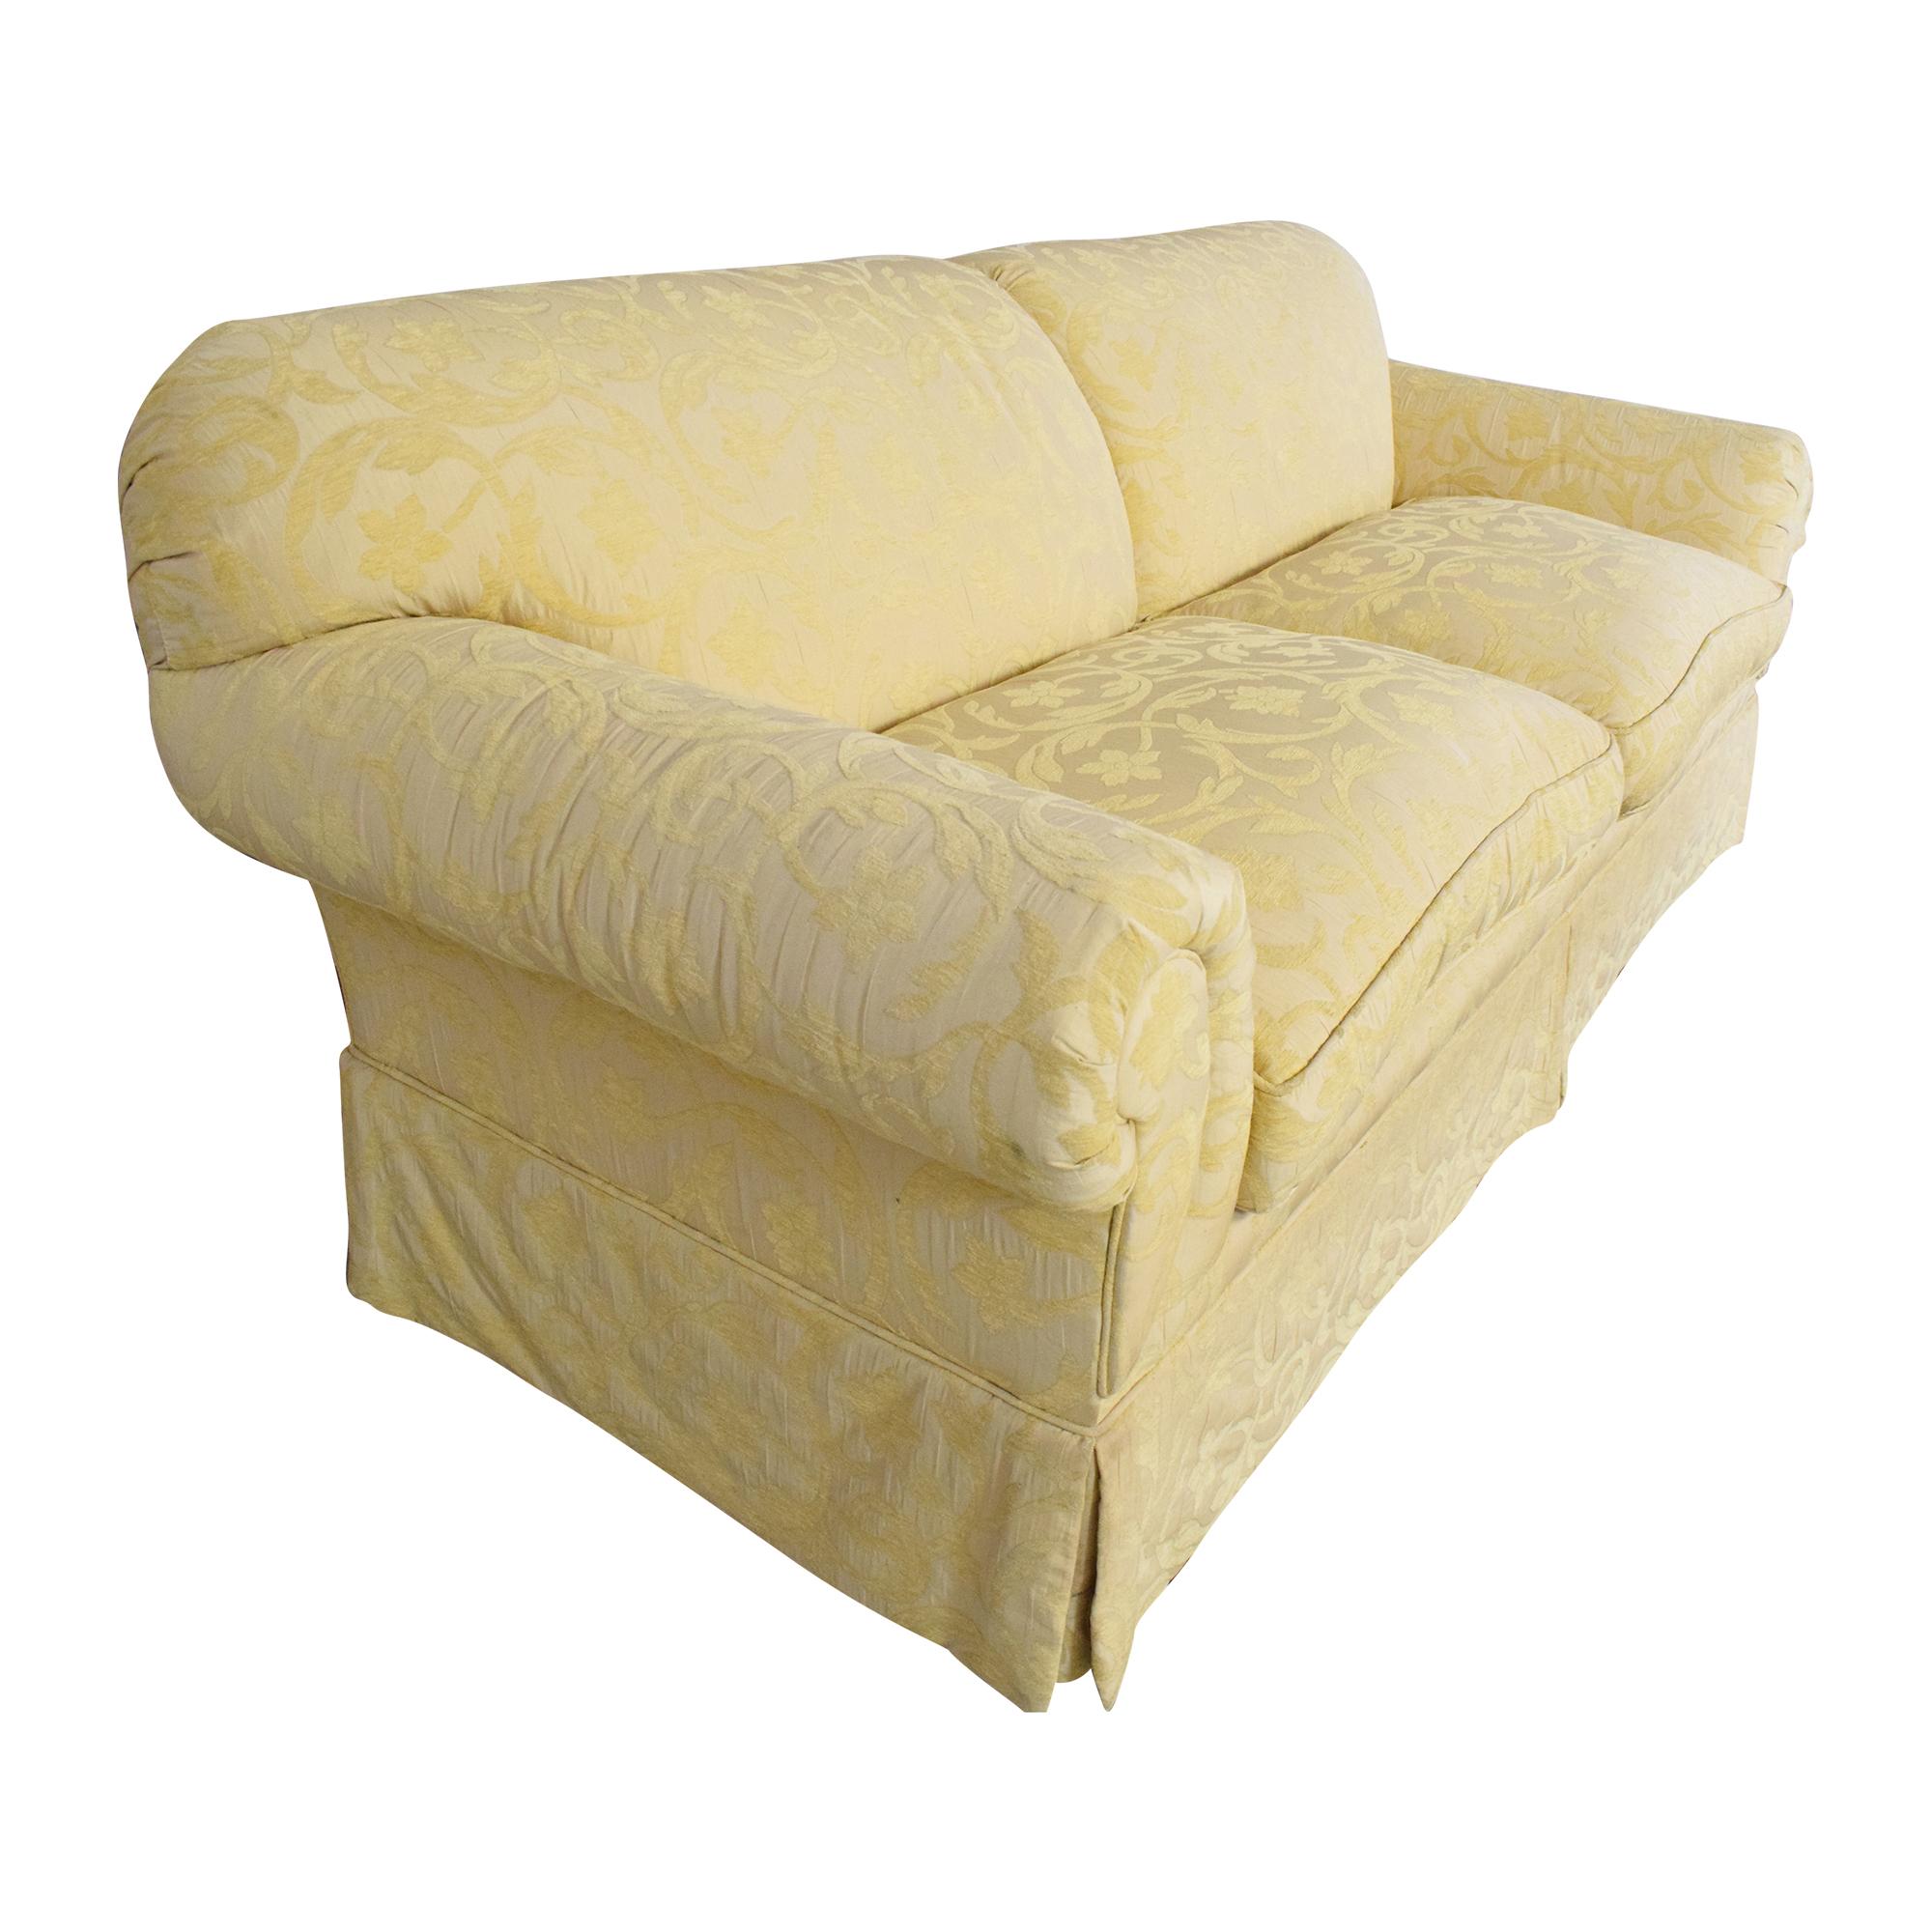 Lee Jofa Lee Jofa Two Cushion Sofa for sale